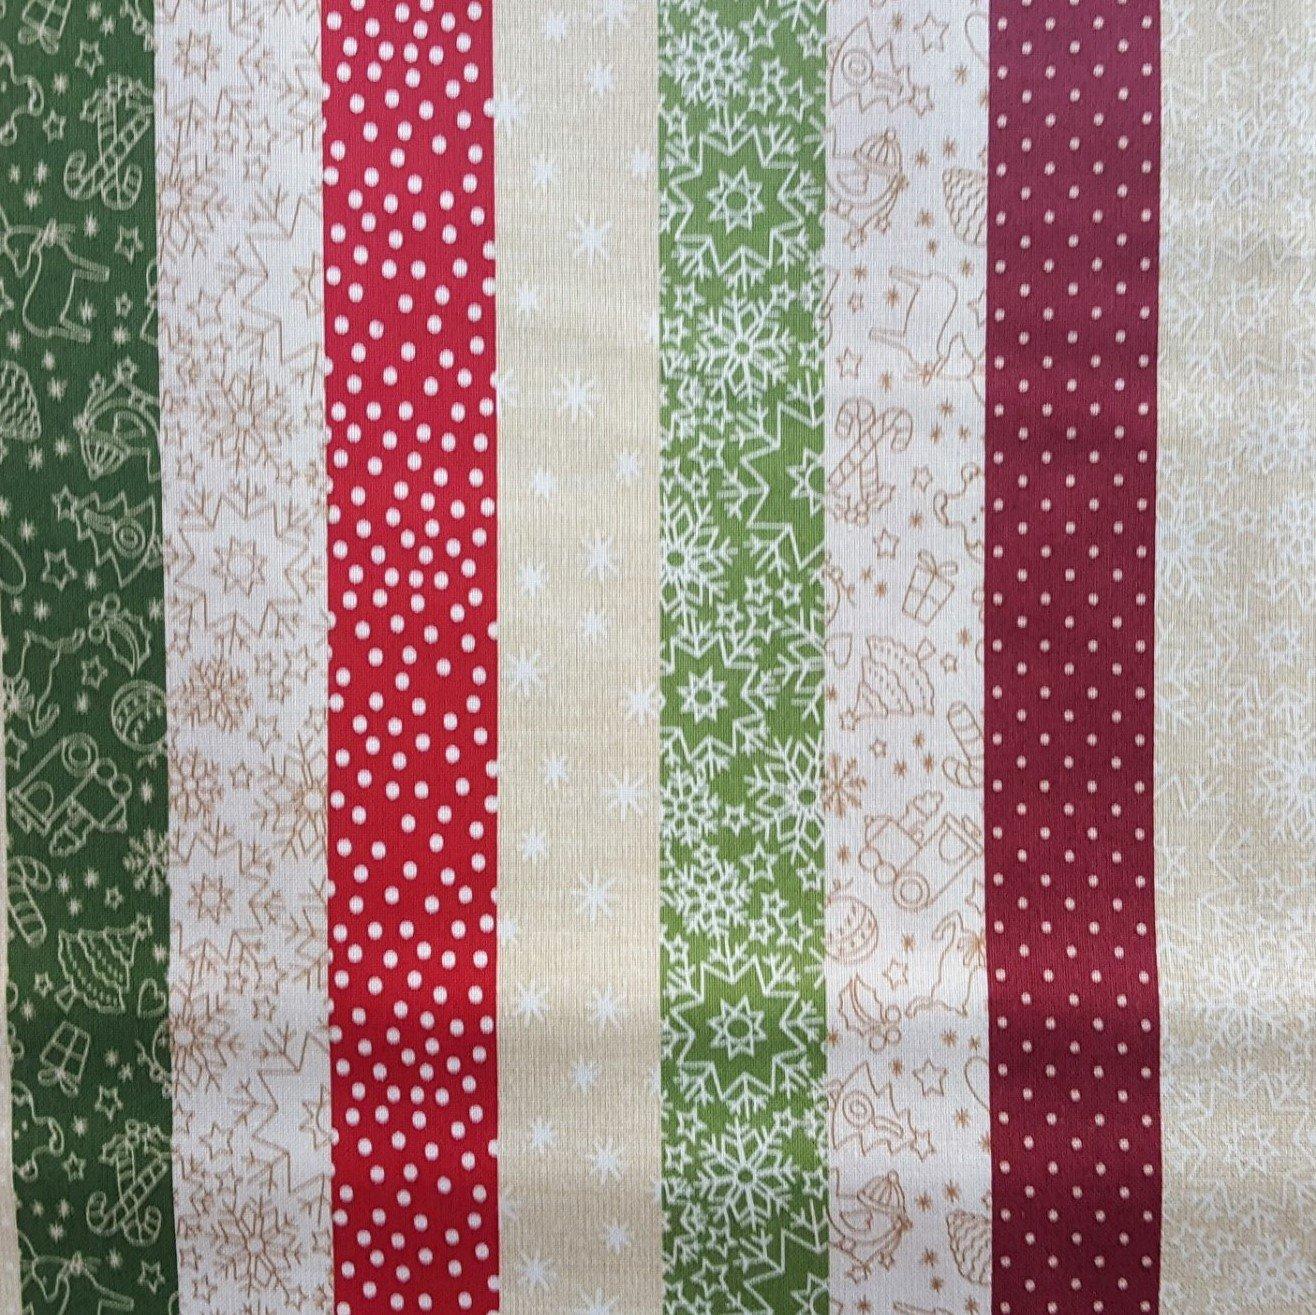 2777-0166 Wrapped In Joy Multi-colored stripe